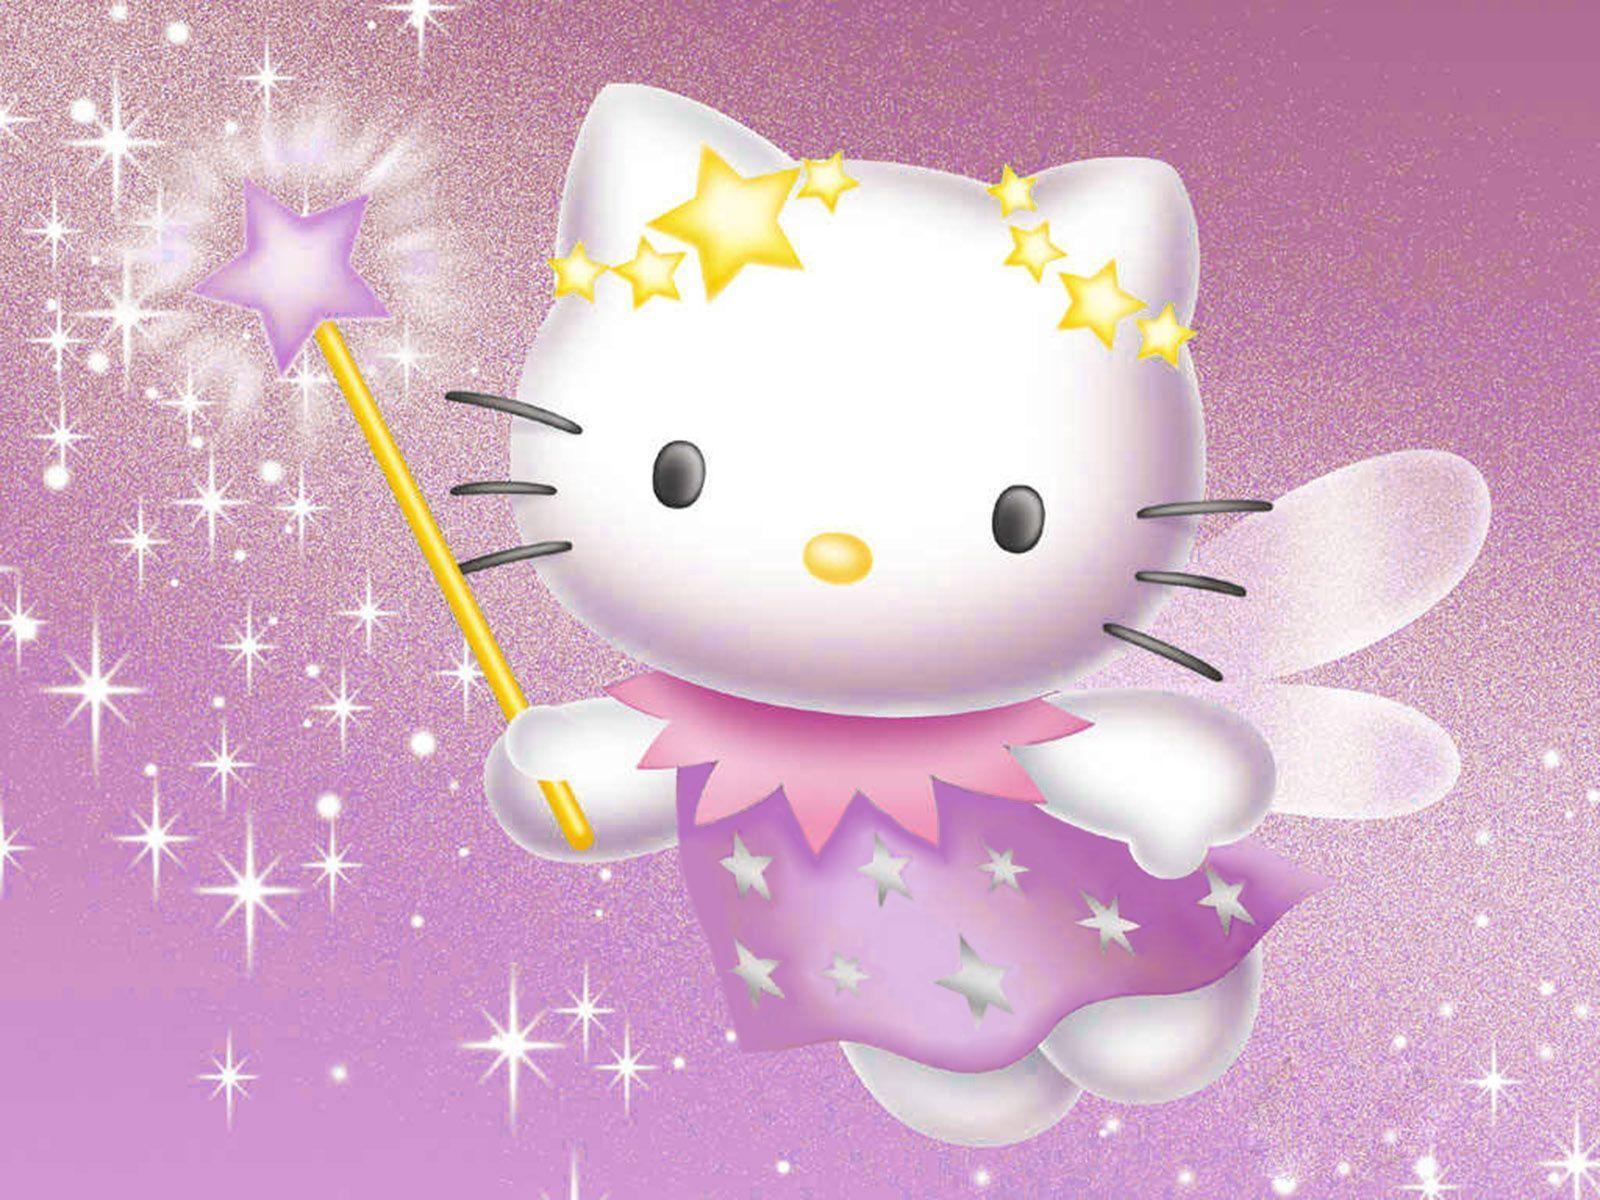 hd wallpaper kitty - photo #39